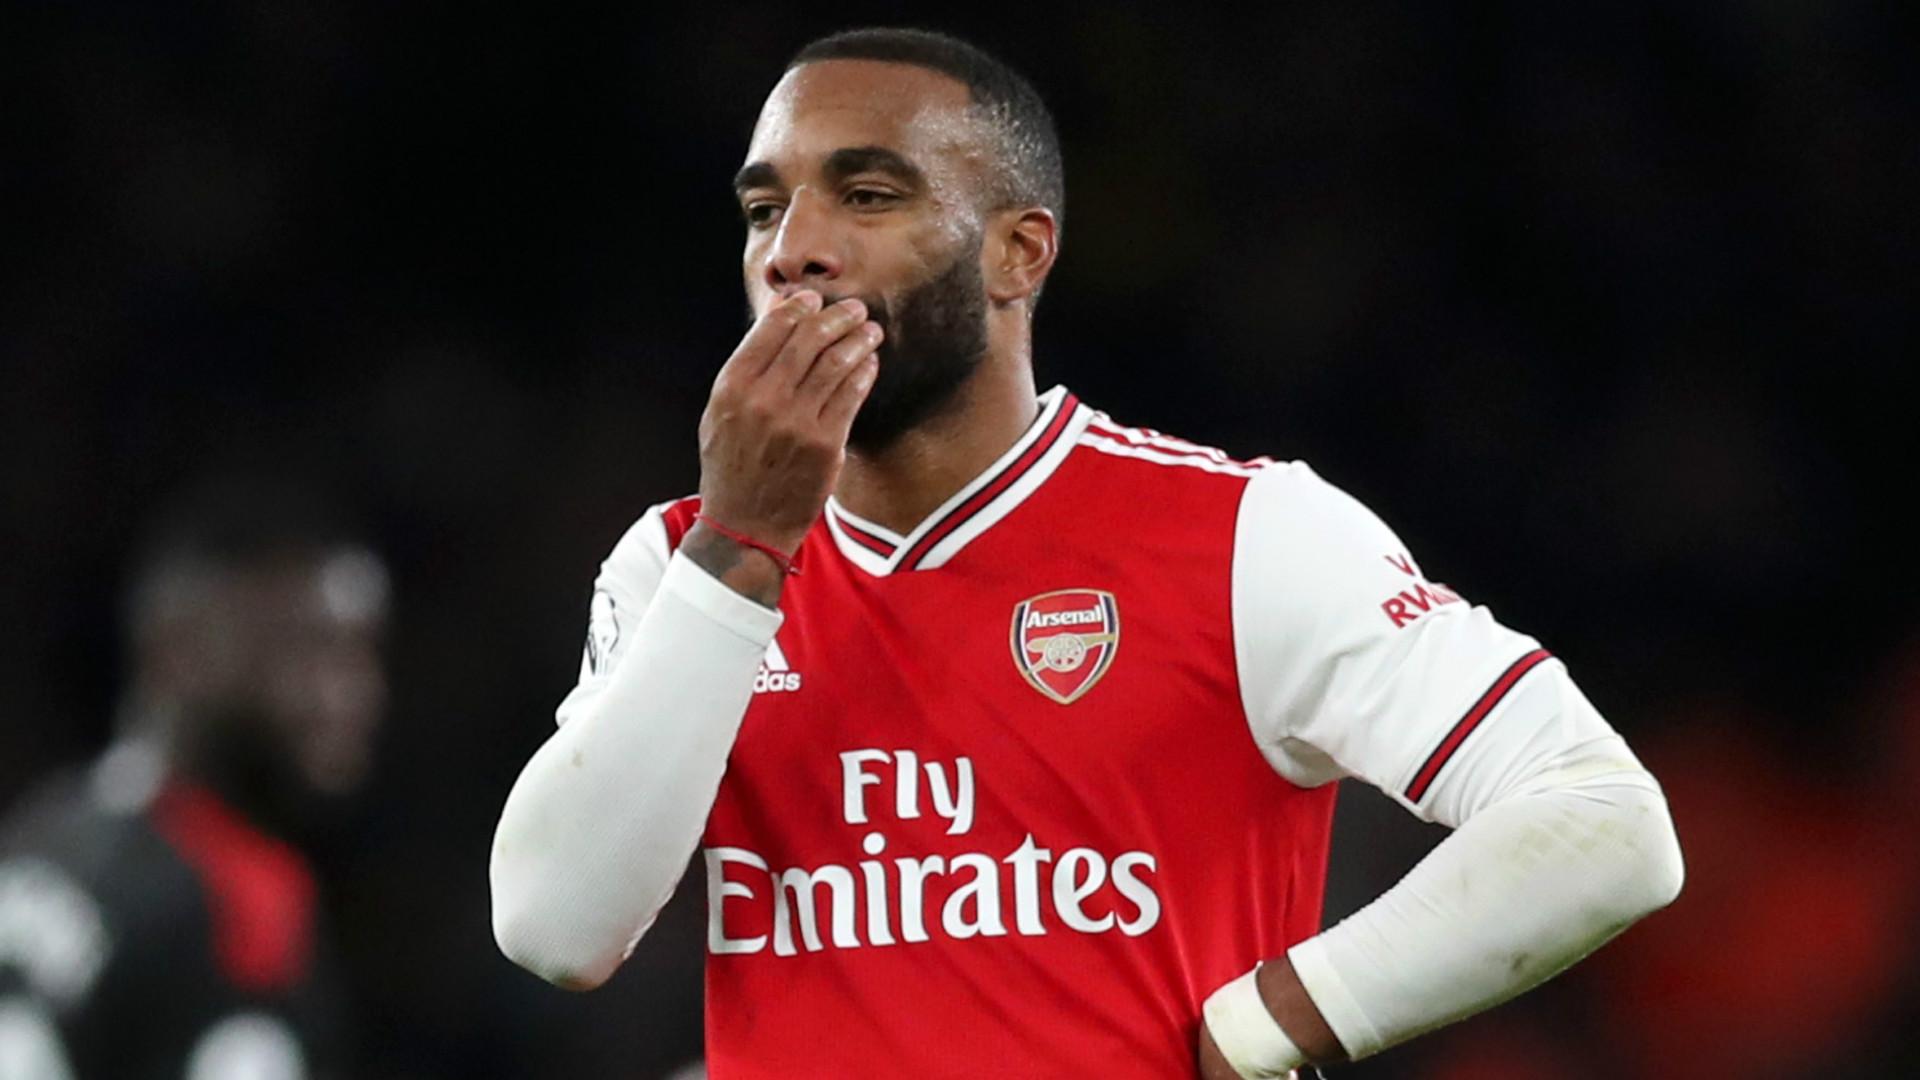 Alexandre Lacazette Arsenal 2019-20